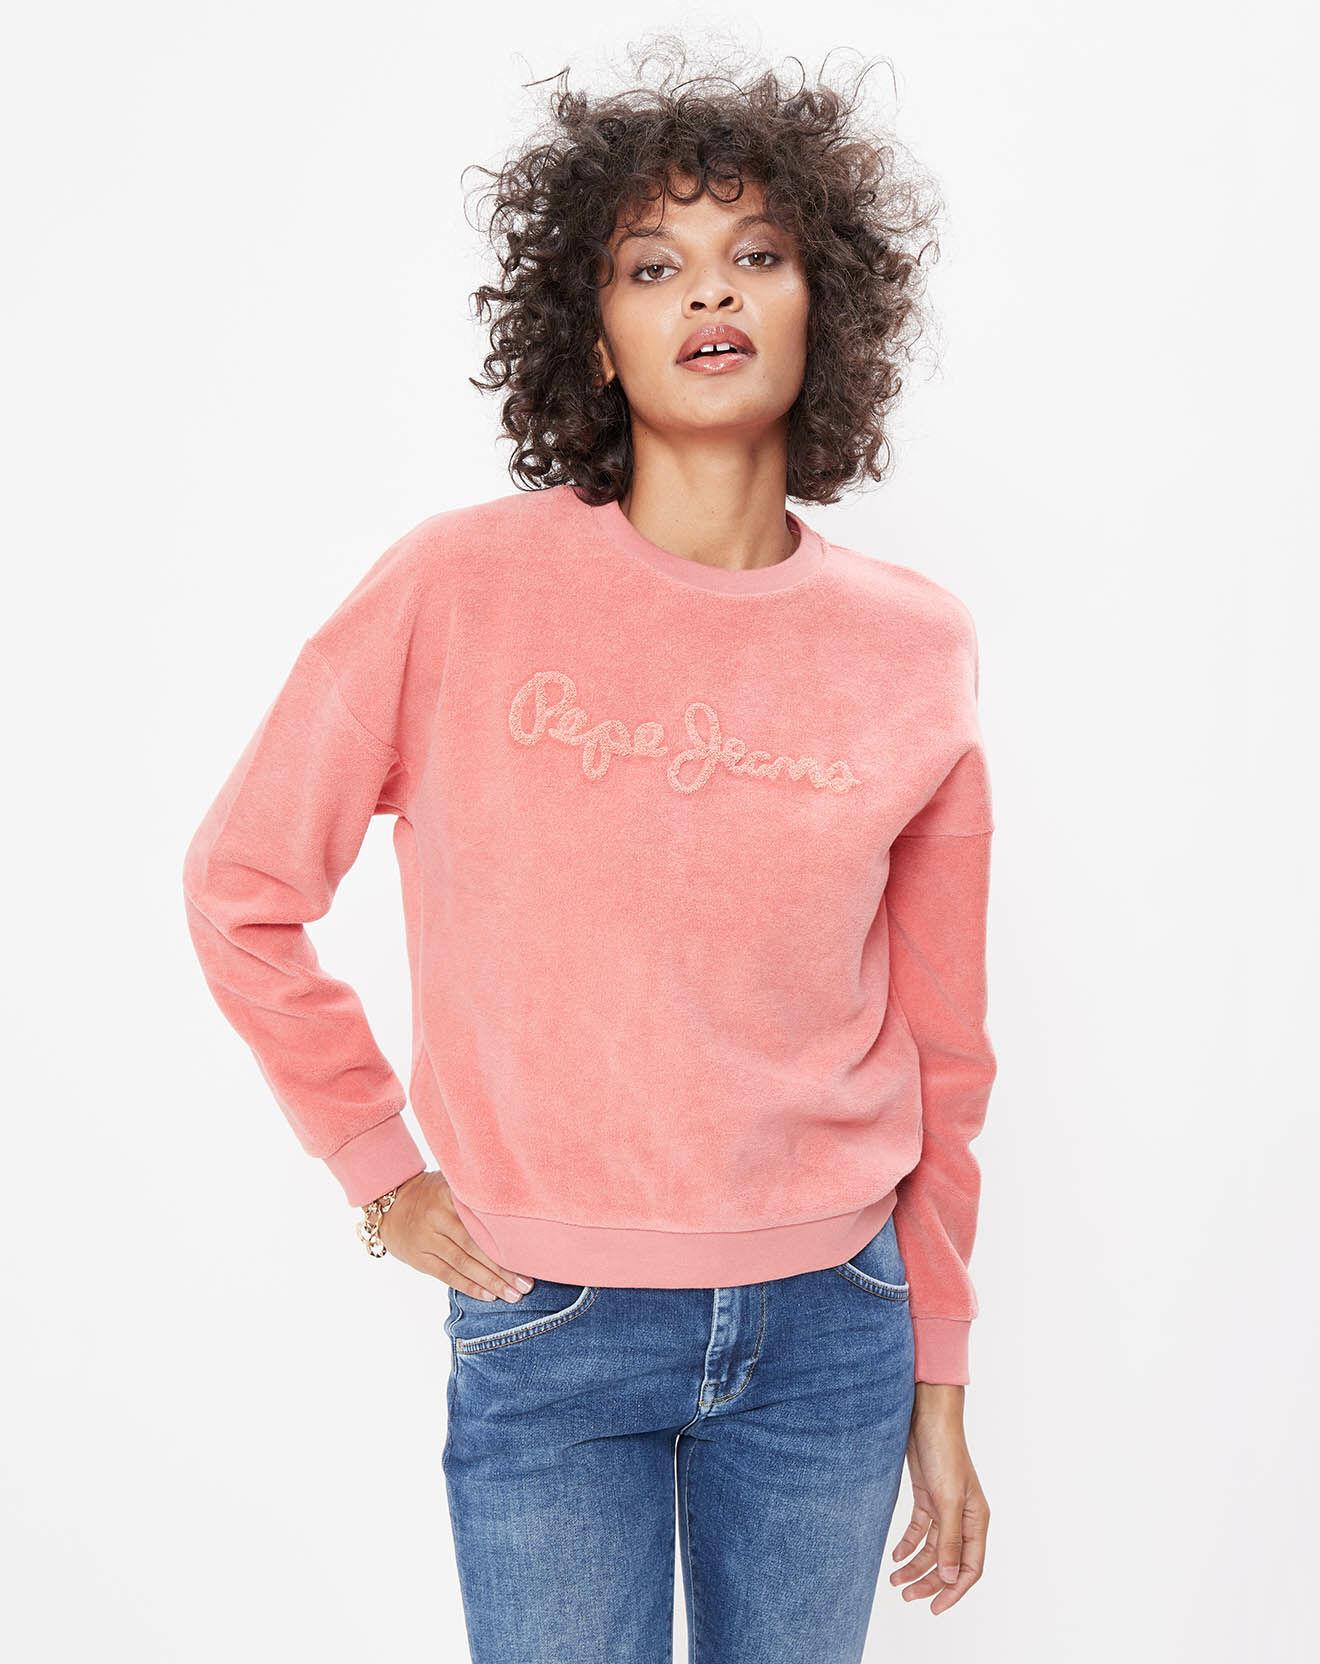 Sweat Polaire Logo ton sur ton rose - Pepe Jeans - Modalova